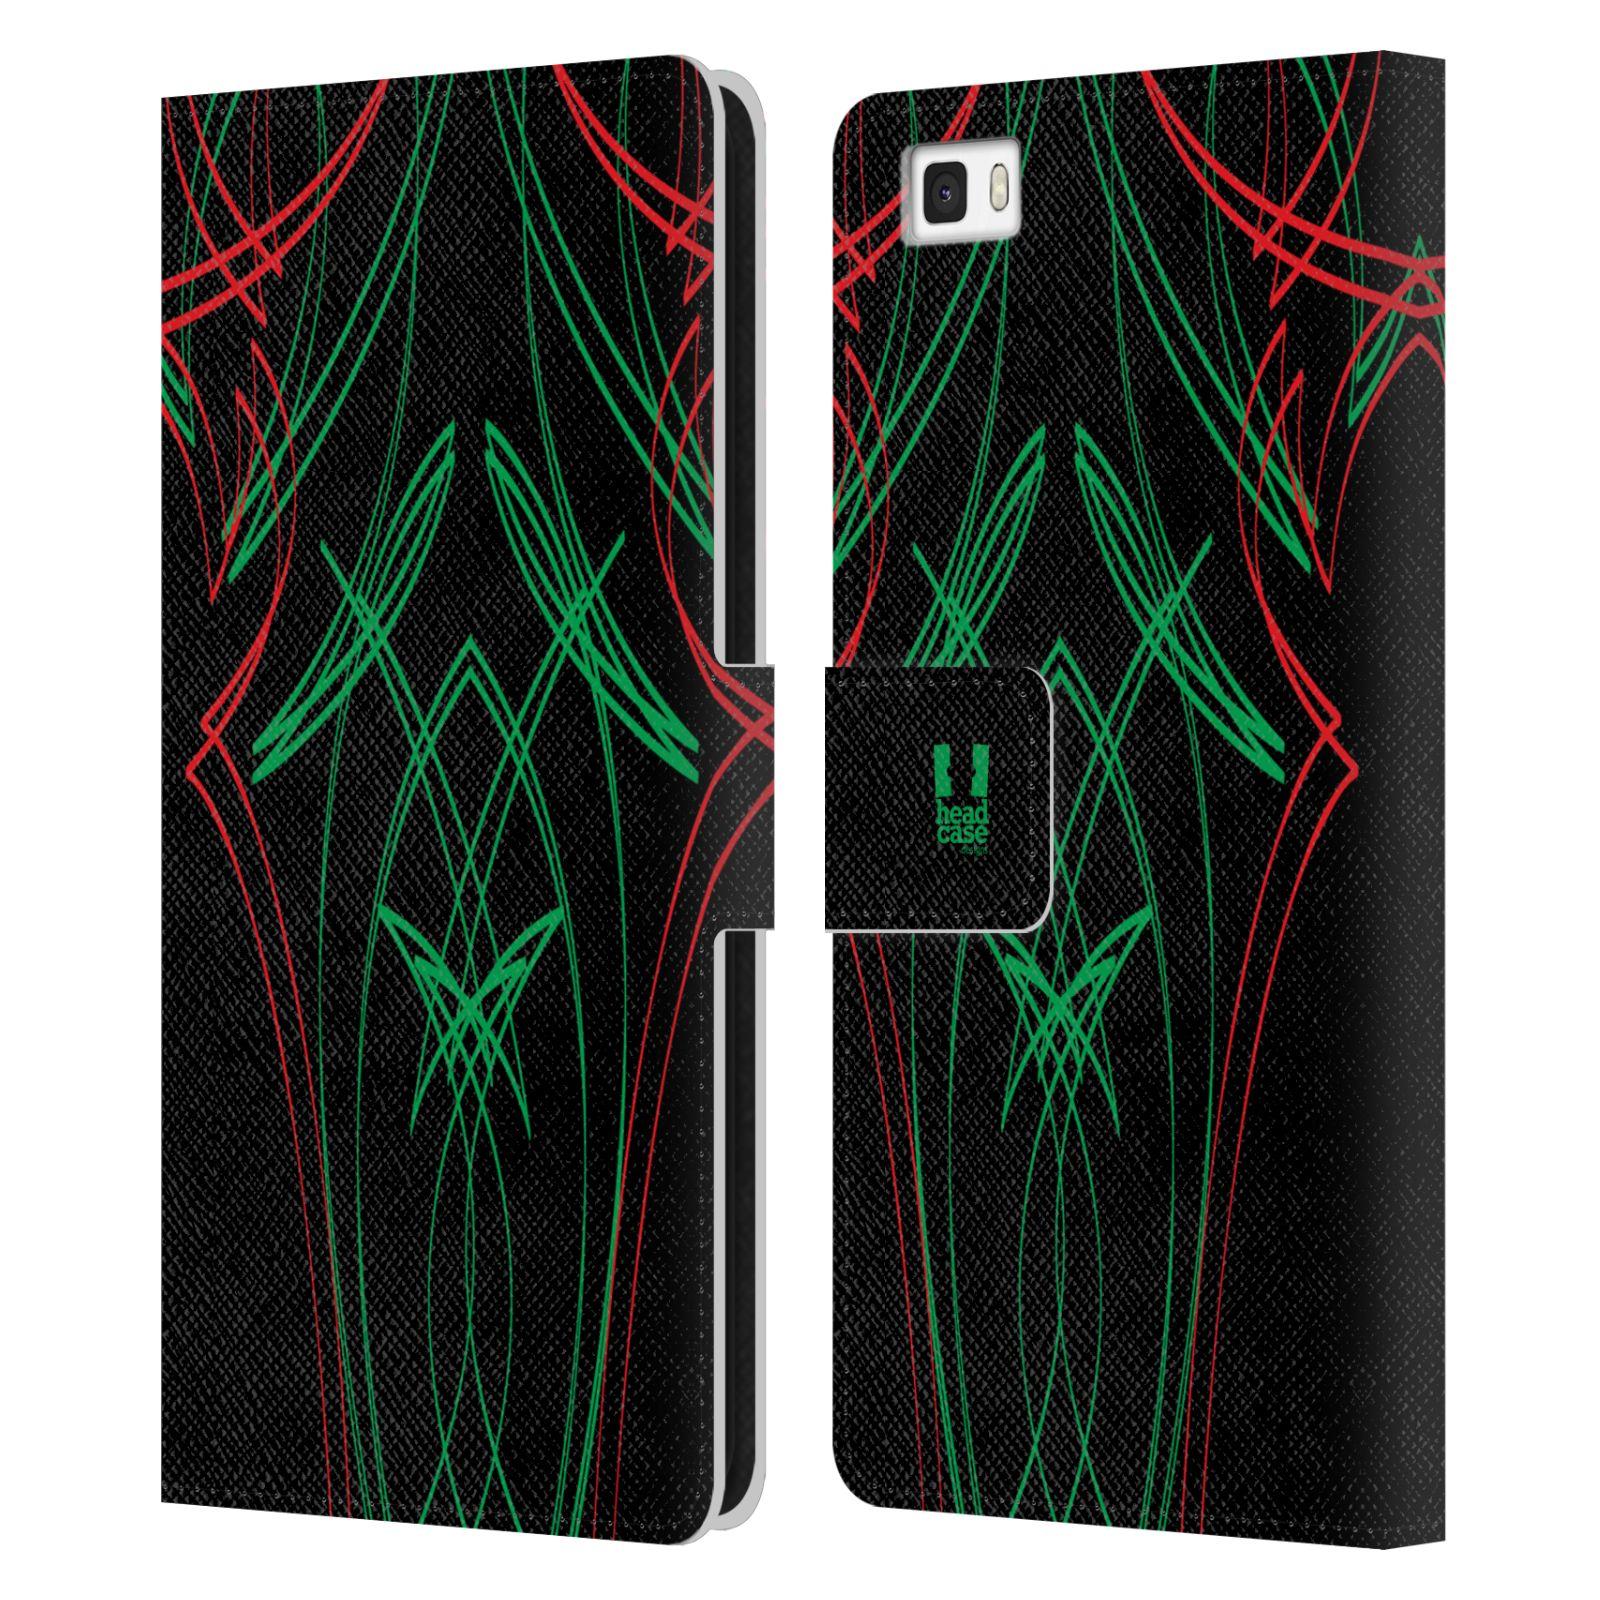 HEAD CASE Flipové pouzdro pro mobil Huawei P8 LITE barevné proužky tvary zelená a červená